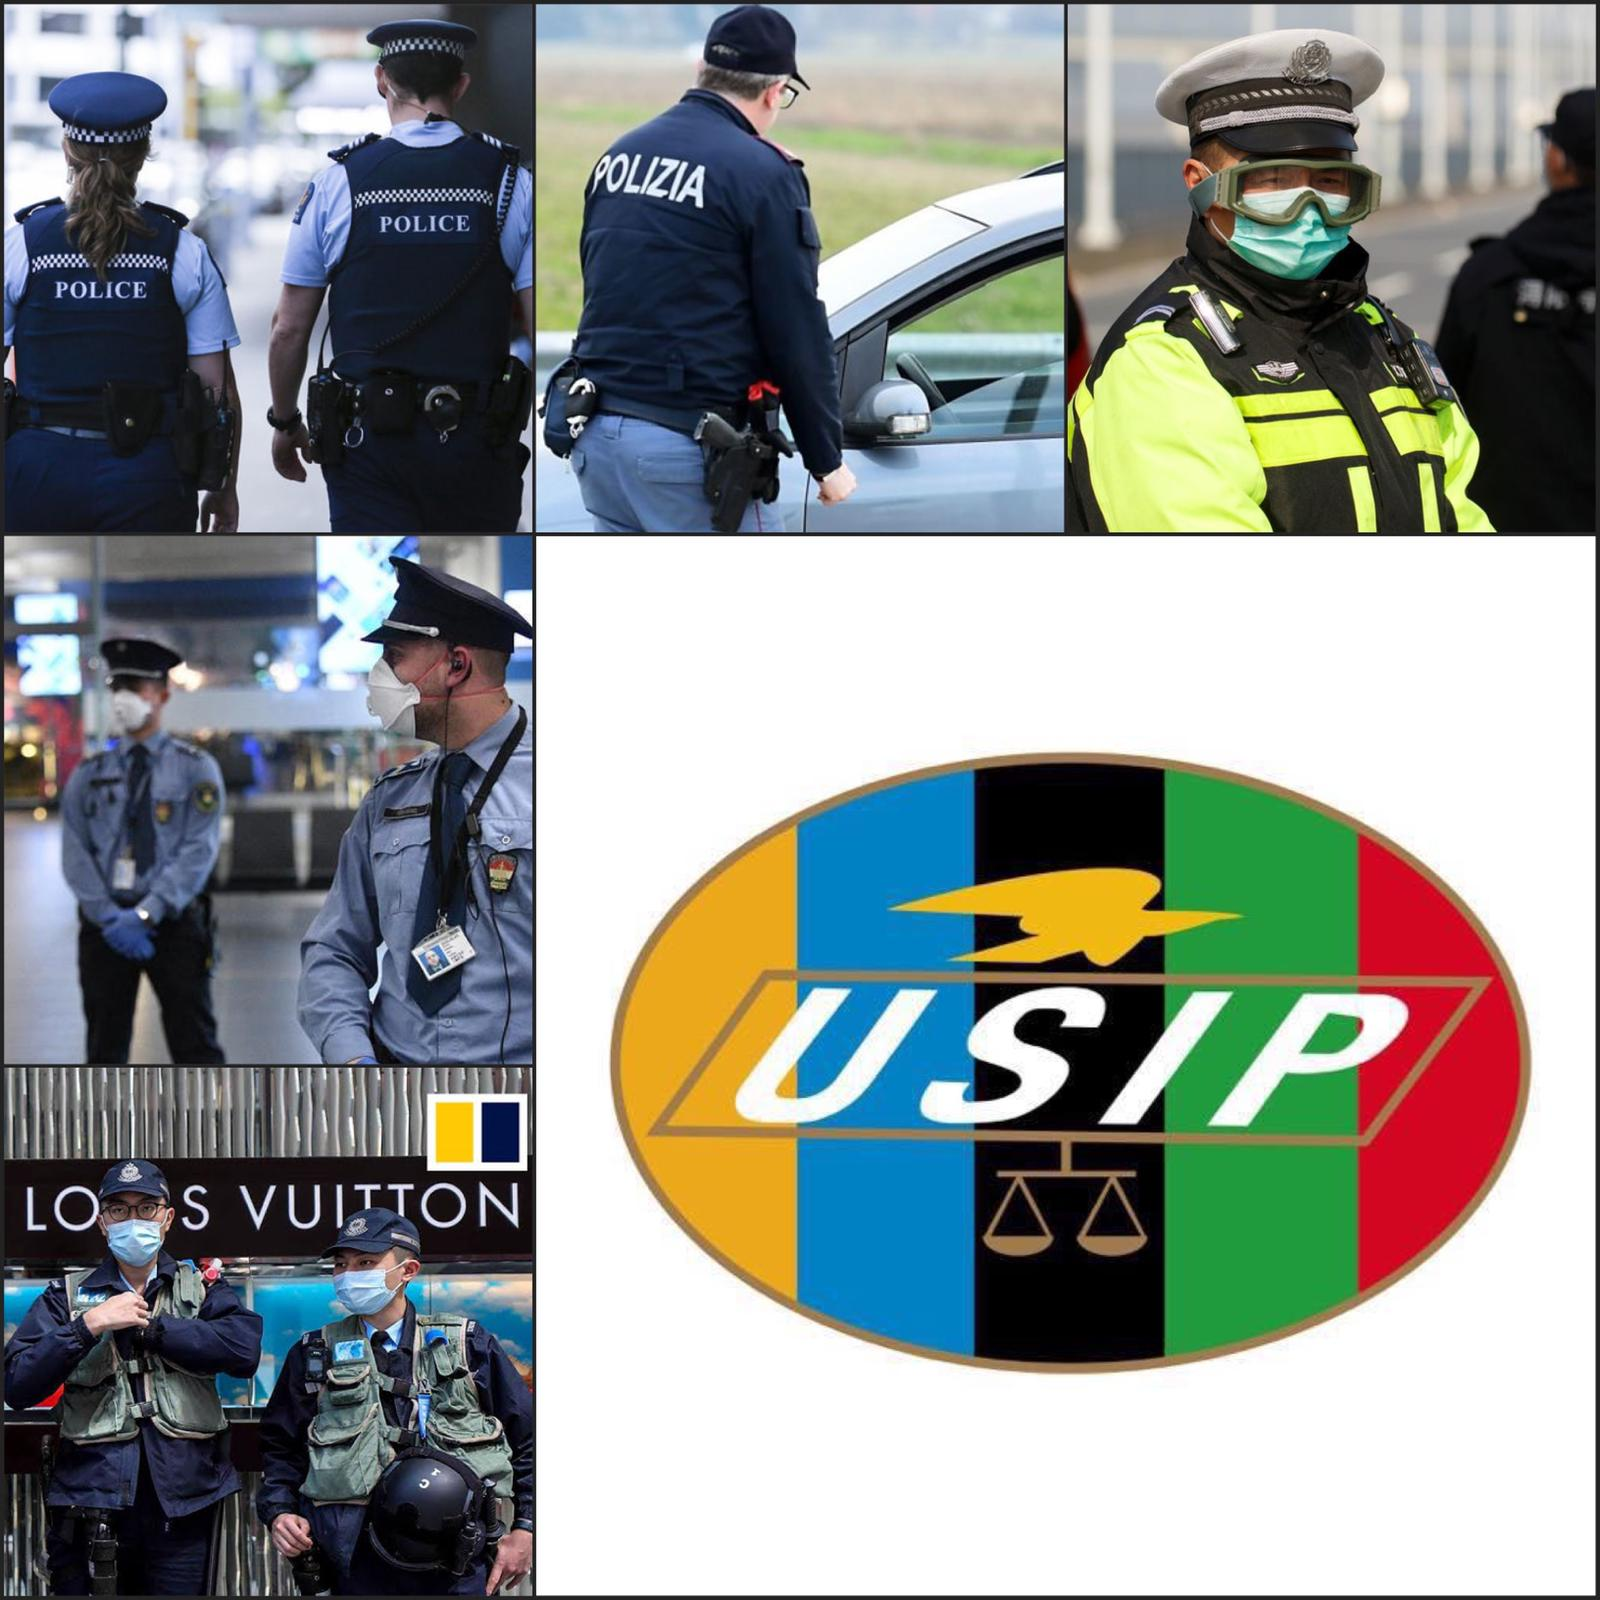 16th USIP Cogress posponed due to Corona virus